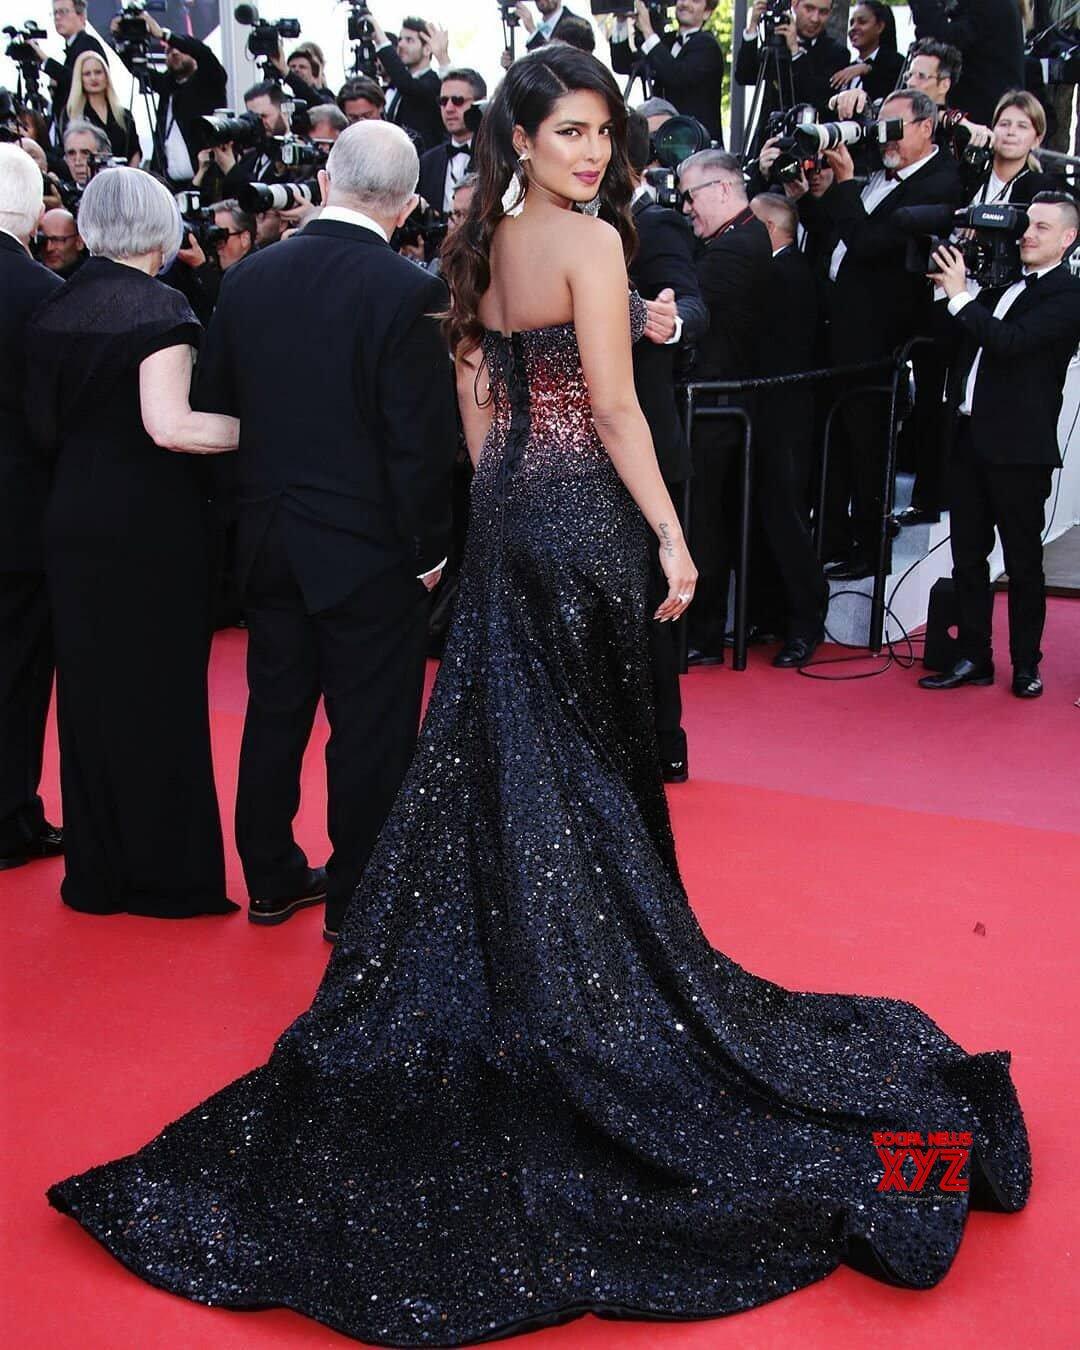 Actress Priyanka Chopra Hot Stills Form Cannes 2019